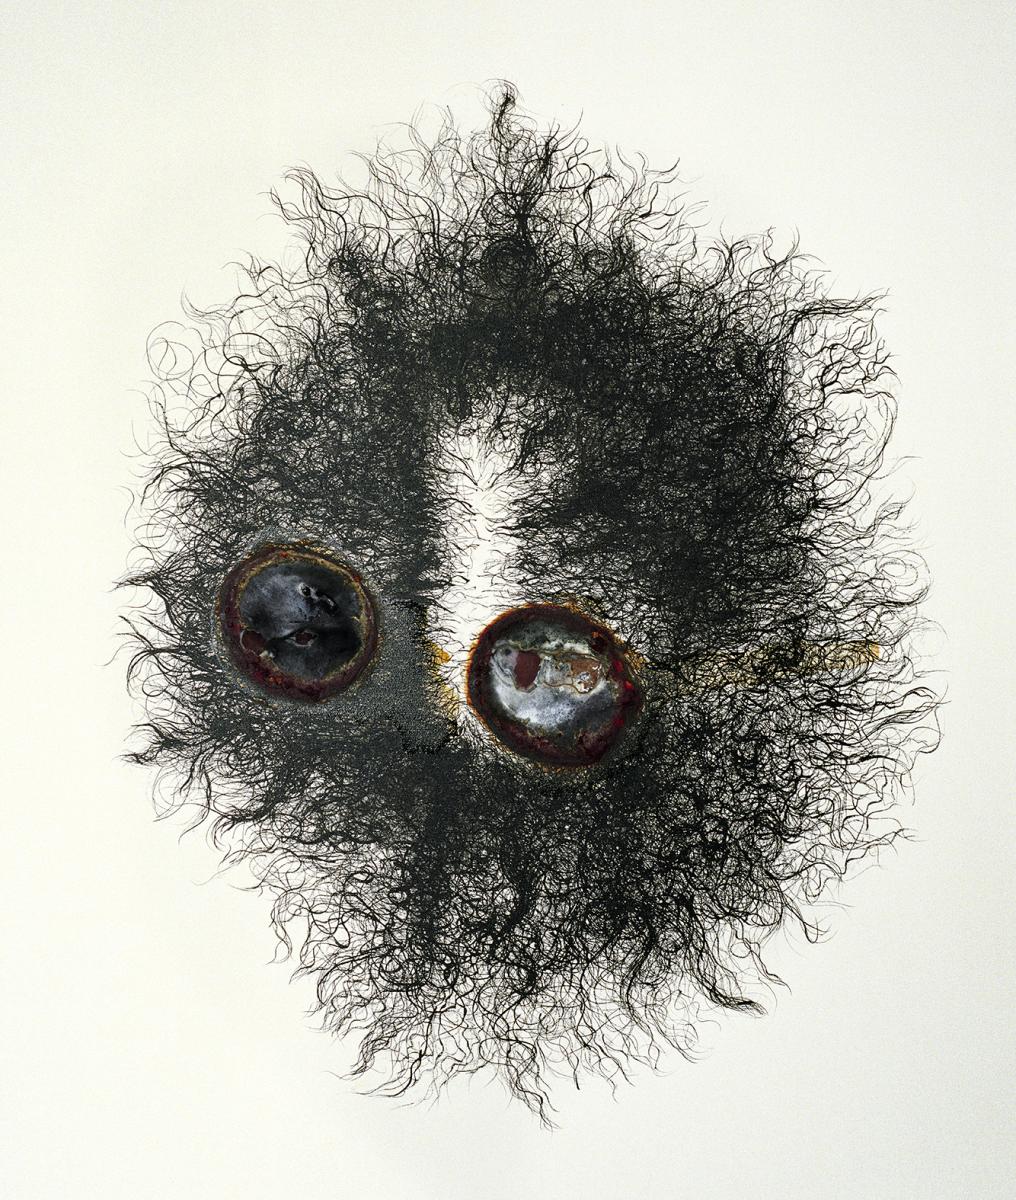 Filip Berendt, Pandemic I, 2009, photography archival print on dibond ed.62AP, 70 x 50 cm